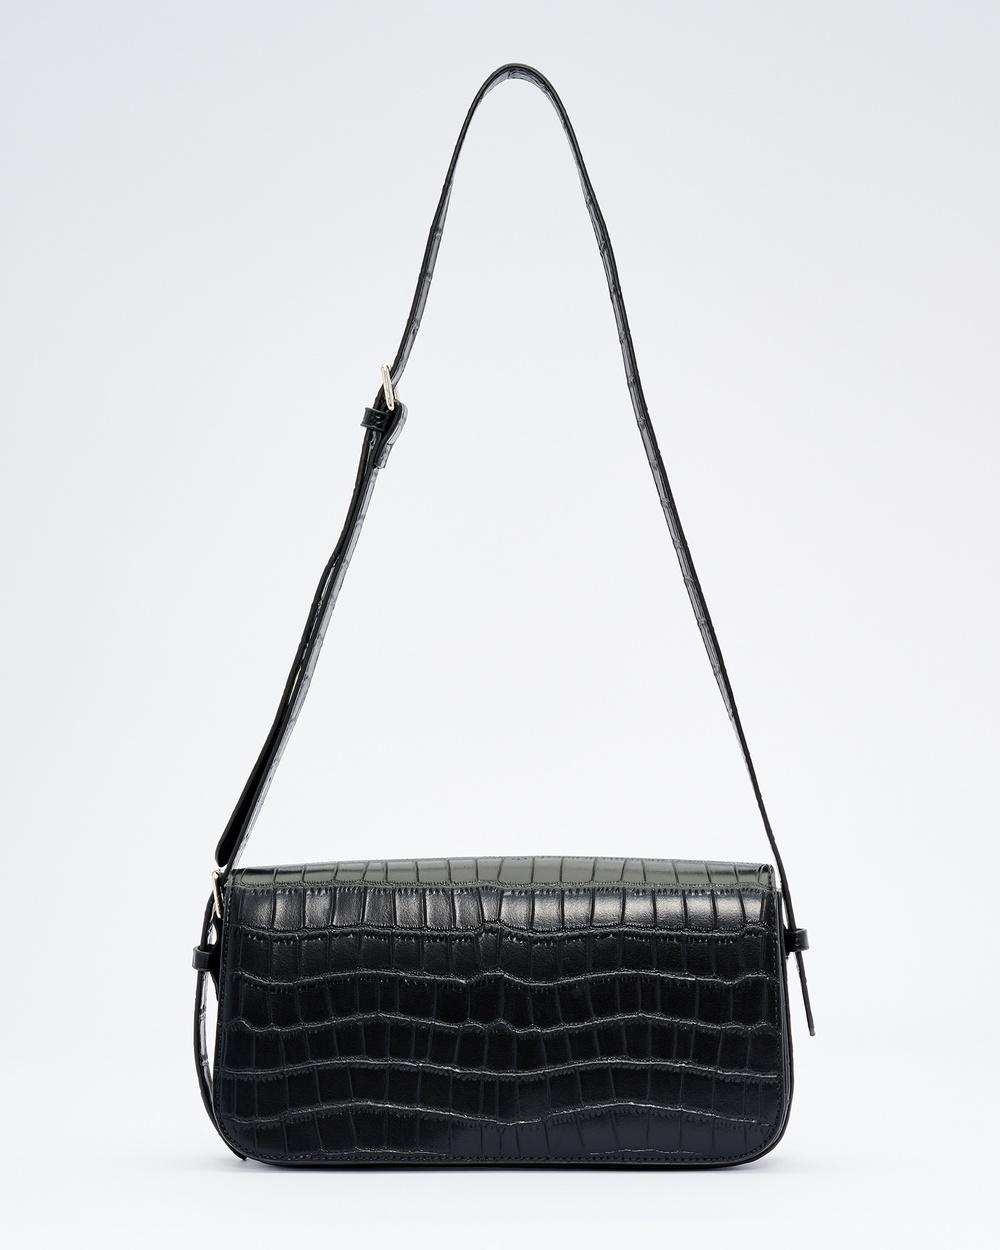 Calli Emra Bag Handbags Black Handbags Australia